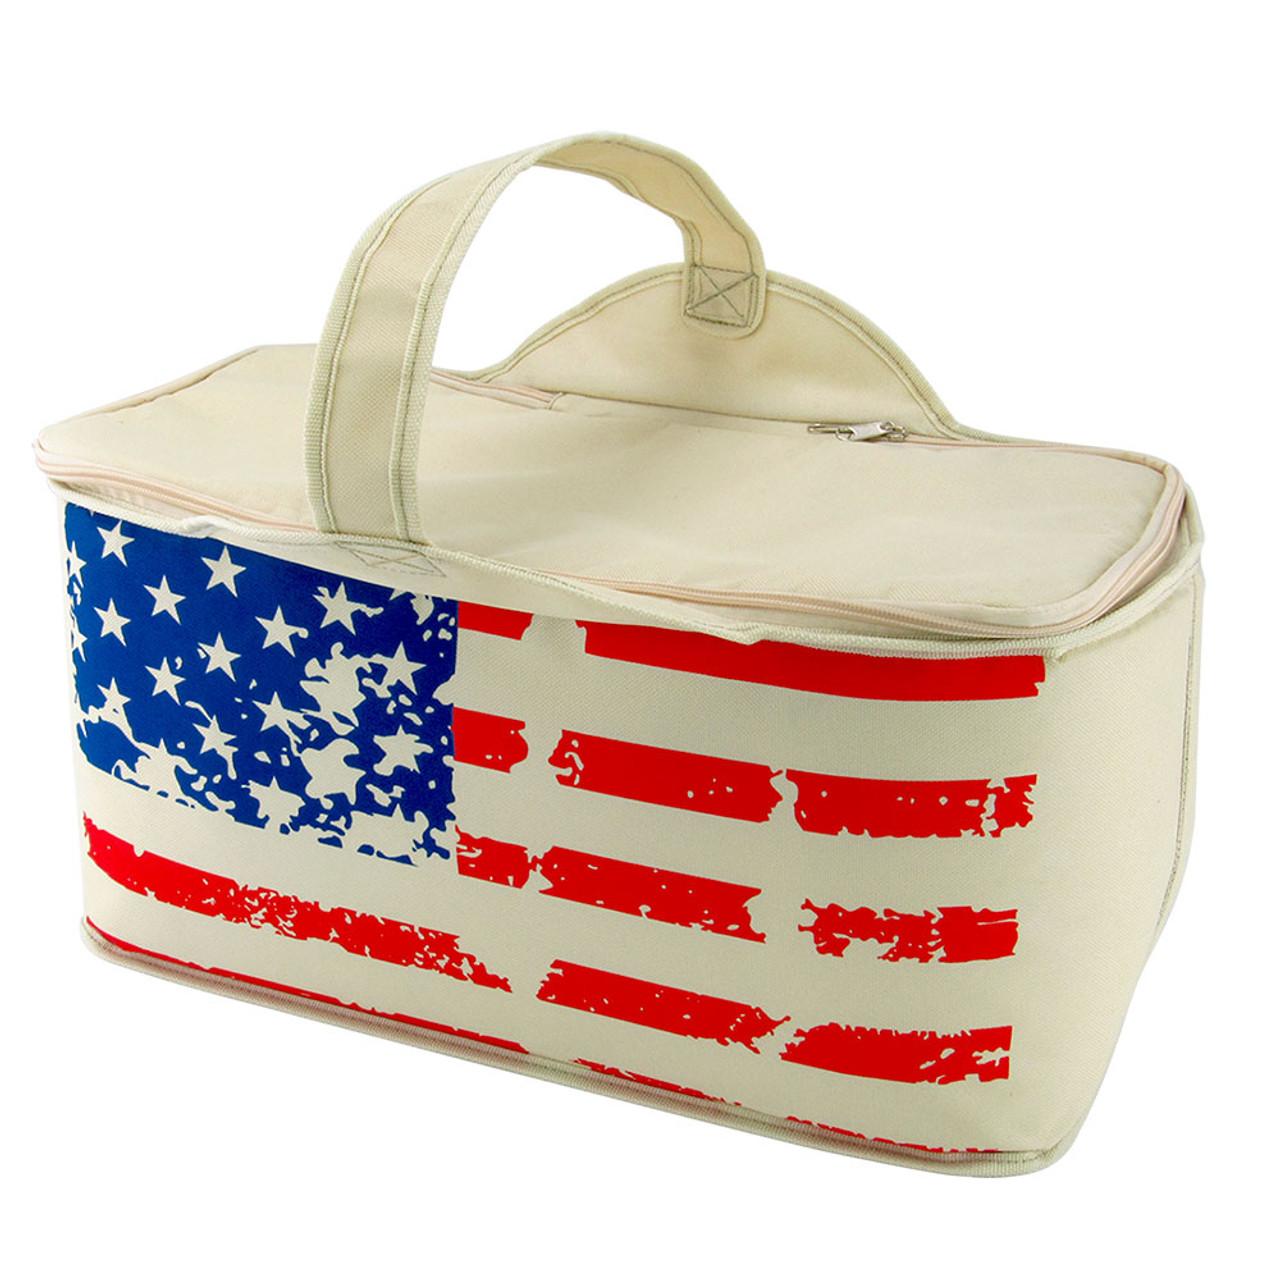 Patriotic Leak Proof Cooler Bag